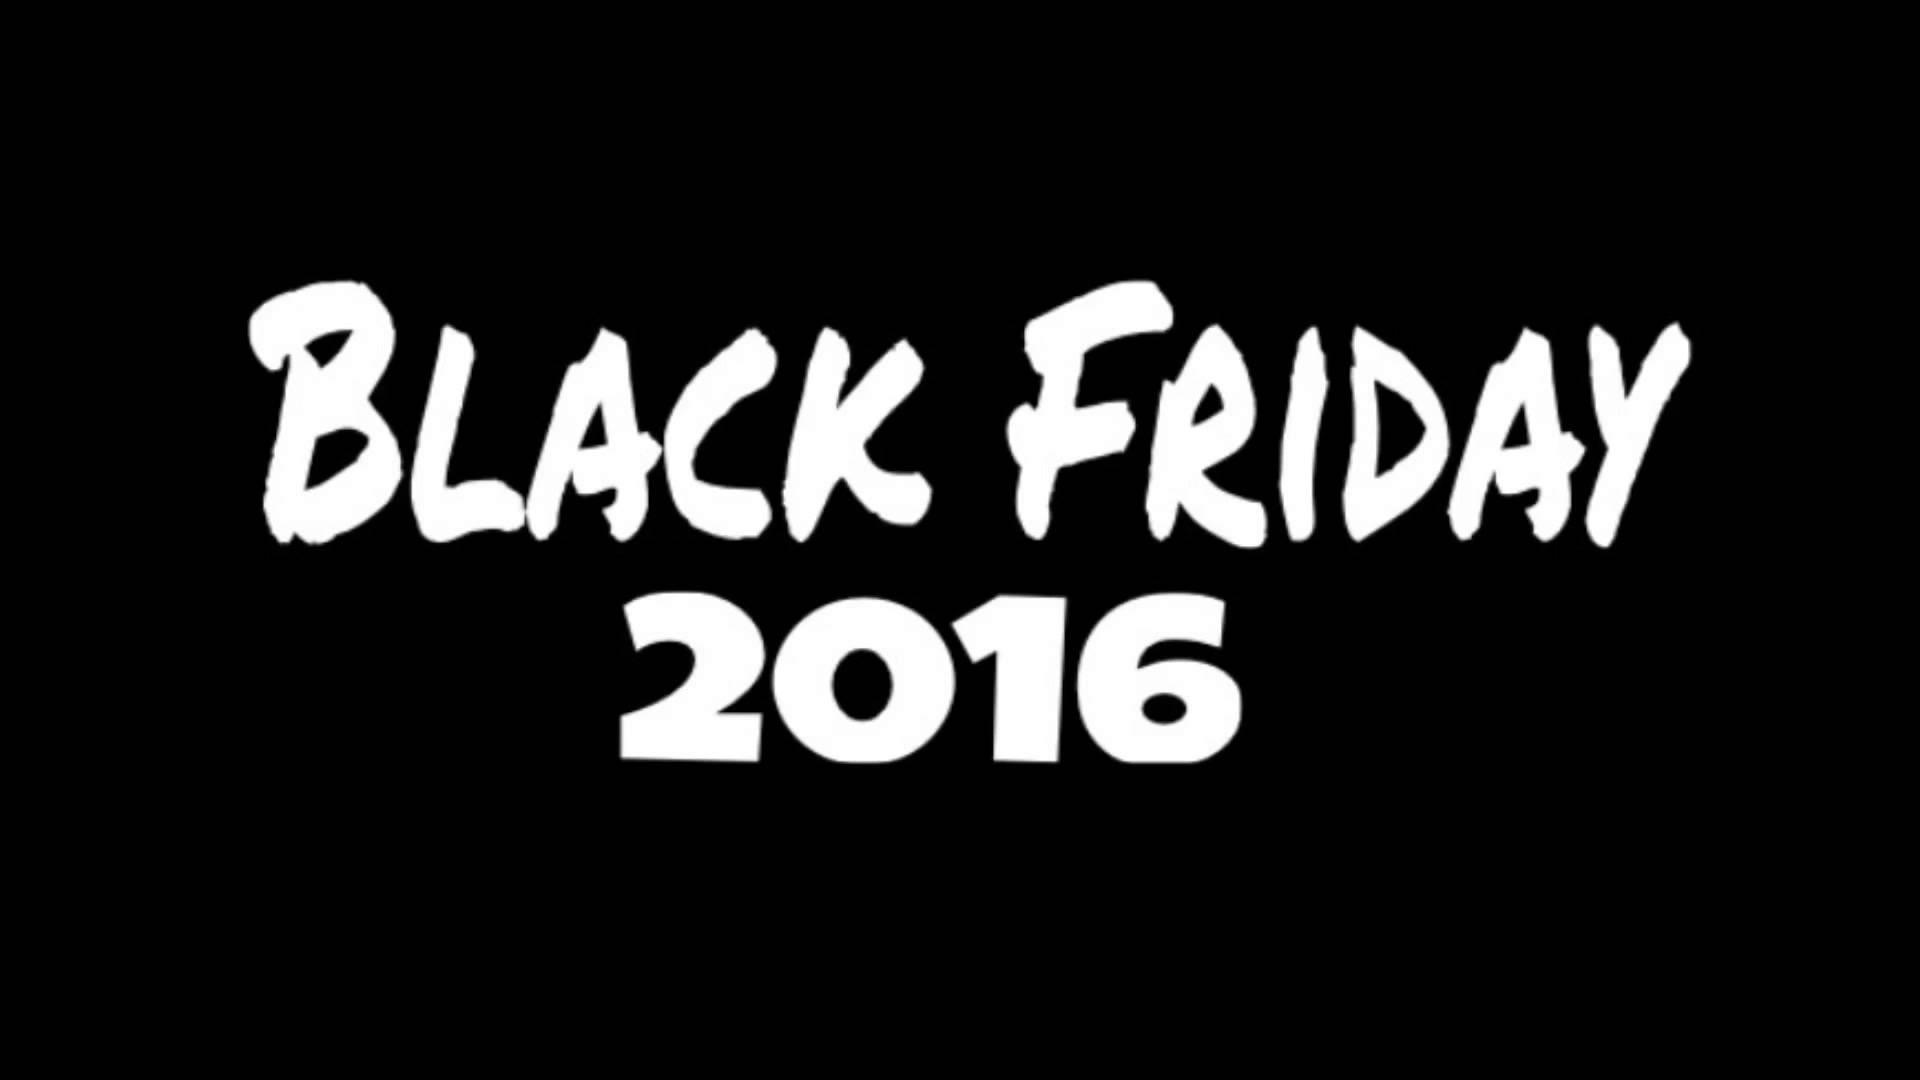 best day black friday 2016